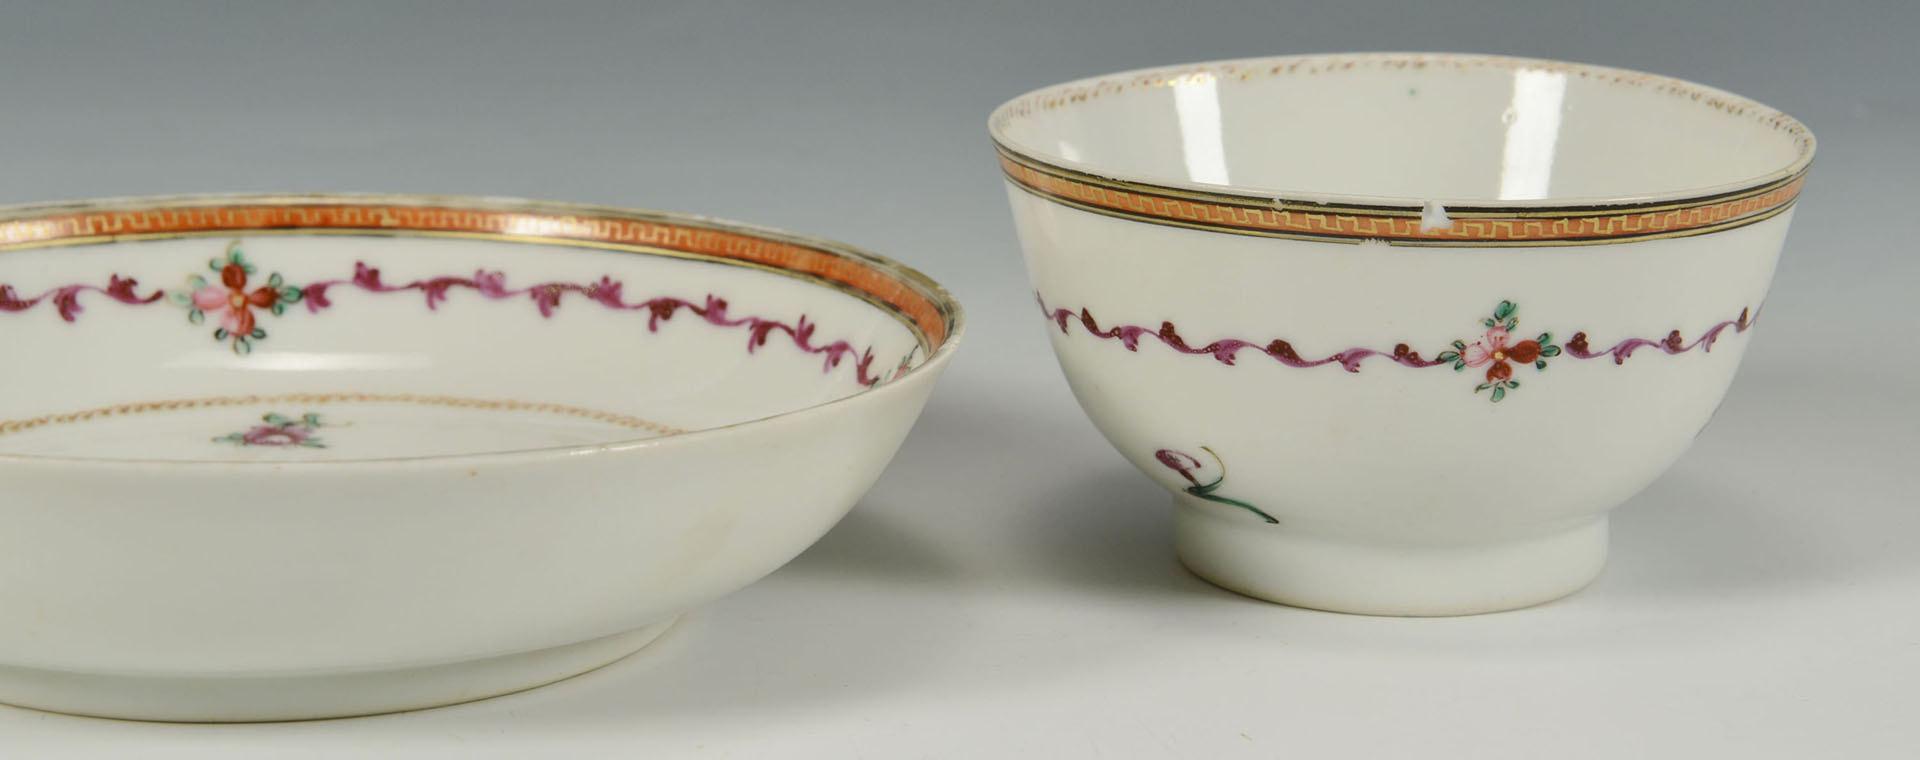 Lot 3088348: 16 pcs. Chinese & English Porcelain